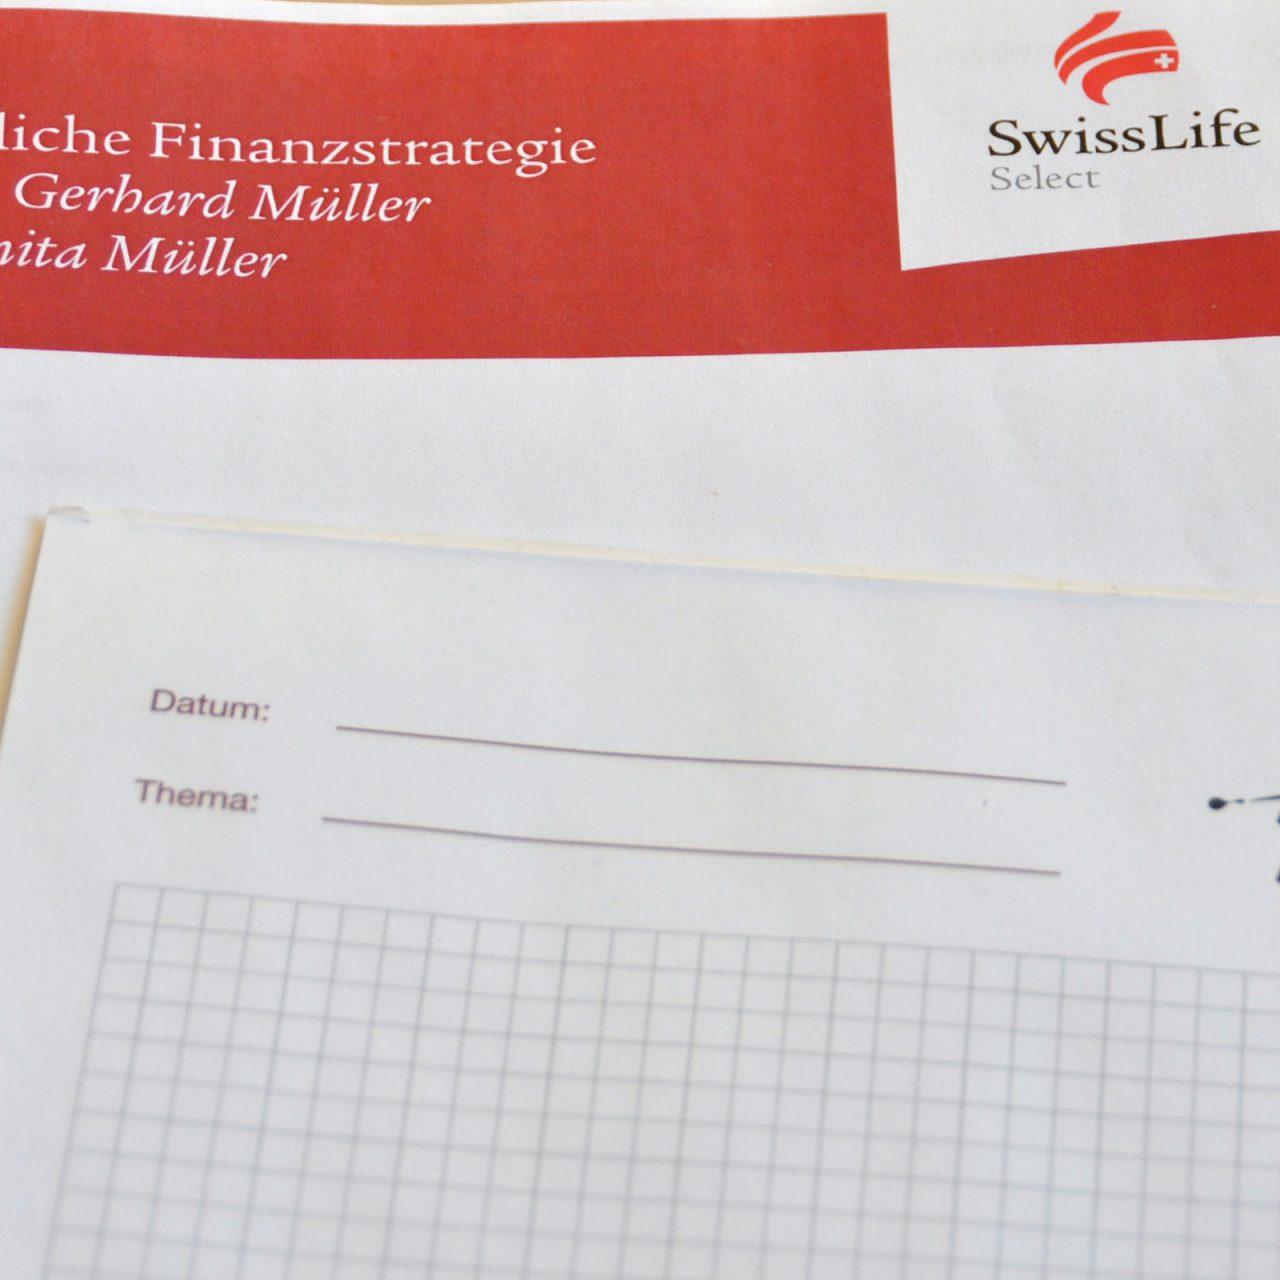 https://www.zukunfthauser.at/wp-content/uploads/2020/05/bg_planen_3-1280x1280.jpg